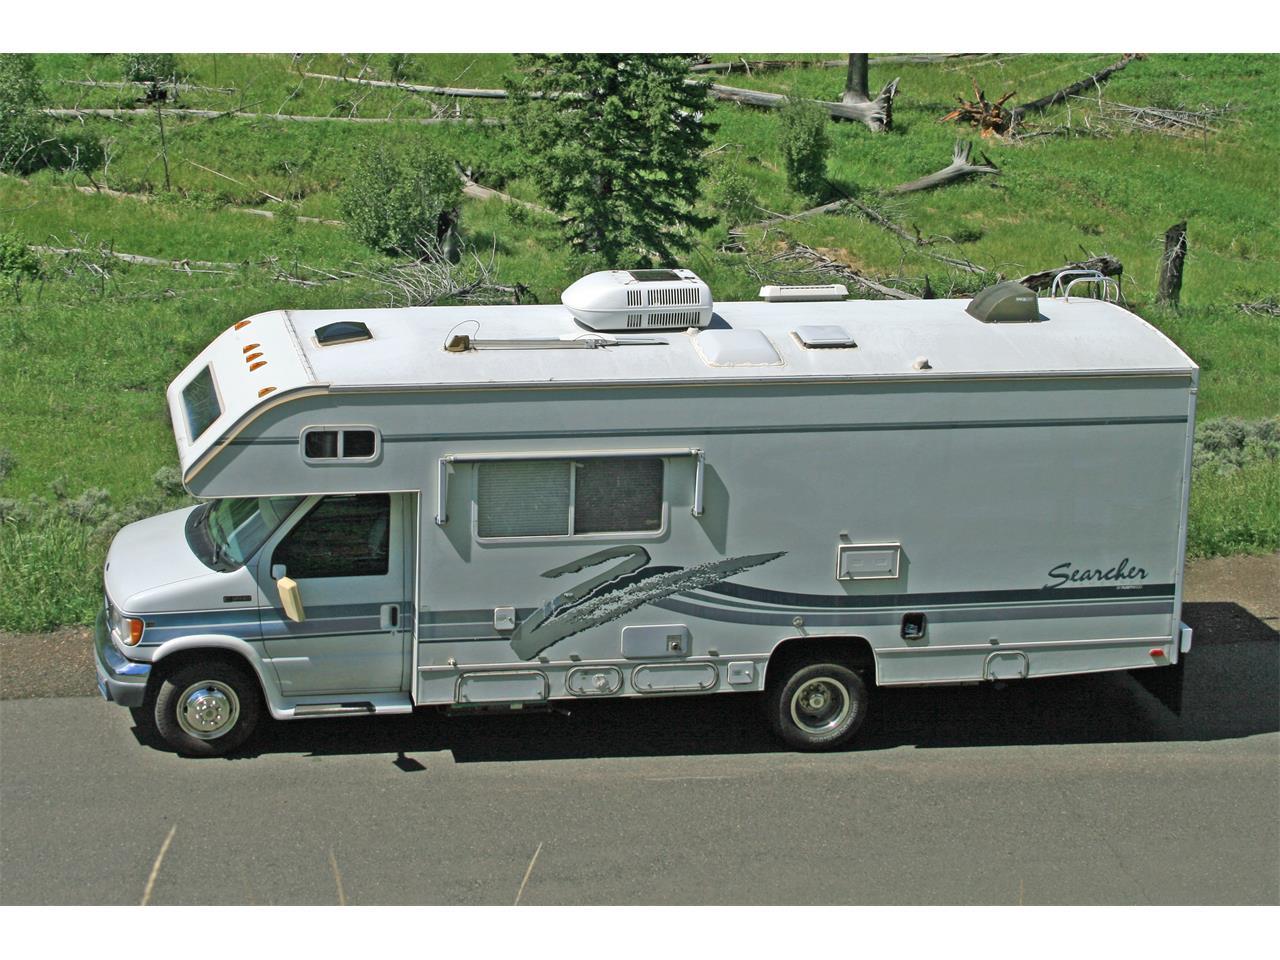 1997 Fleetwood Jamboree (CC-1363830) for sale in Intline Village, Nevada